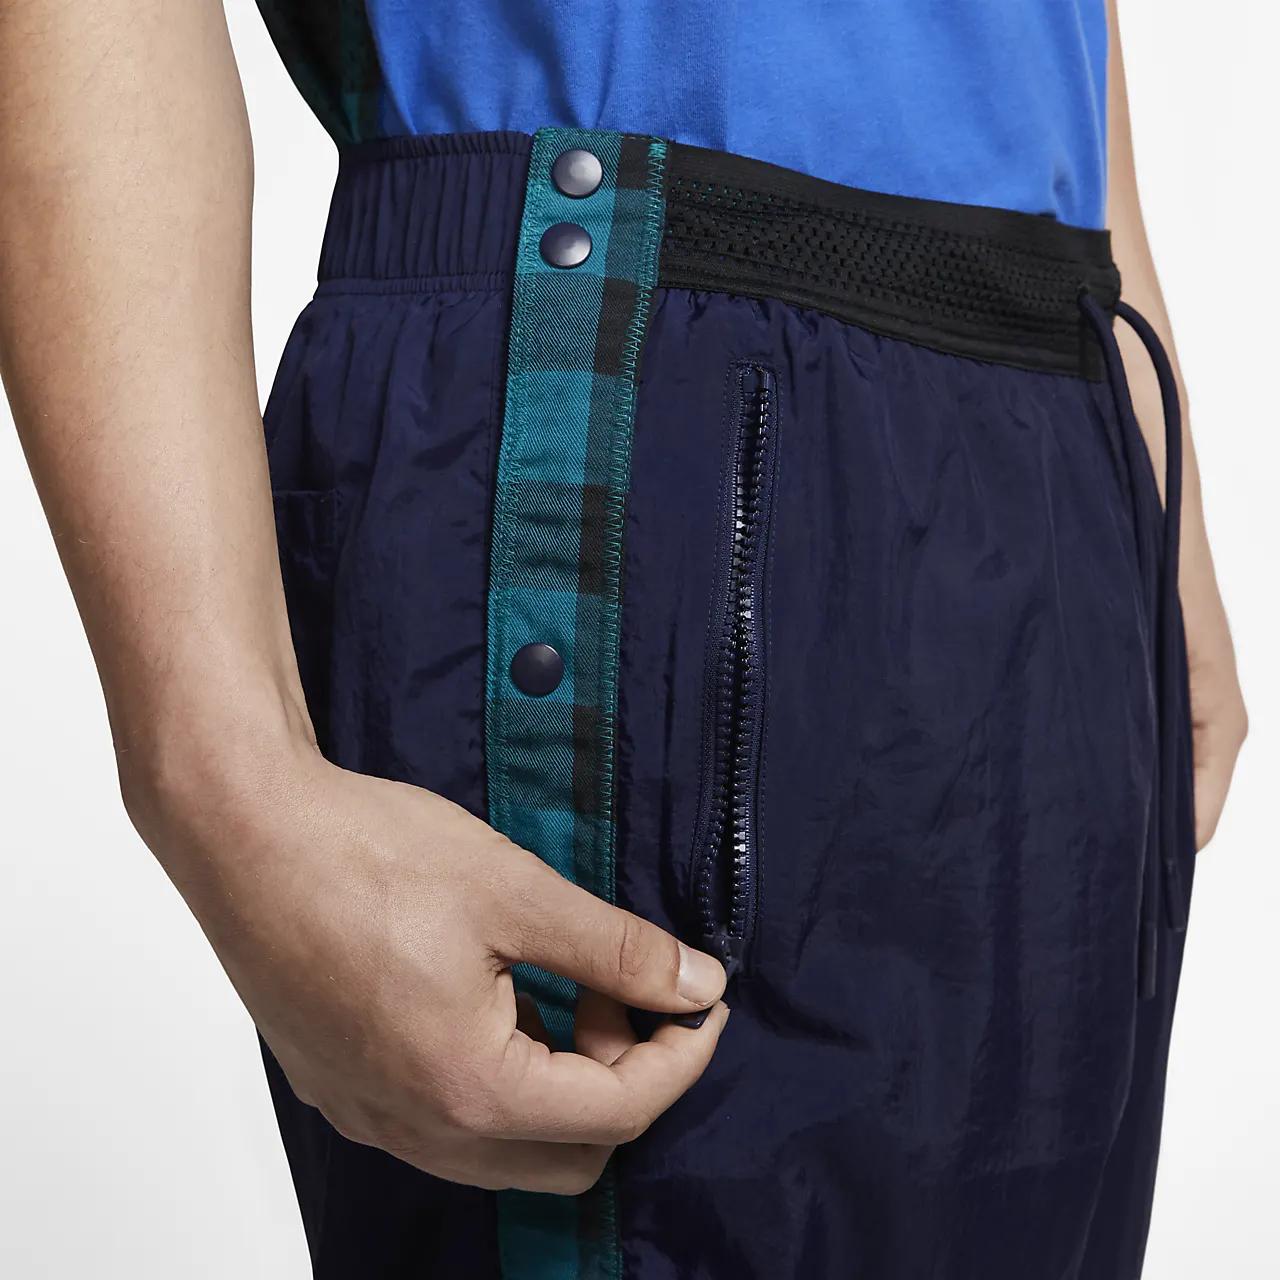 Nike Sportswear NSW Men's Woven Pants BV4546-498